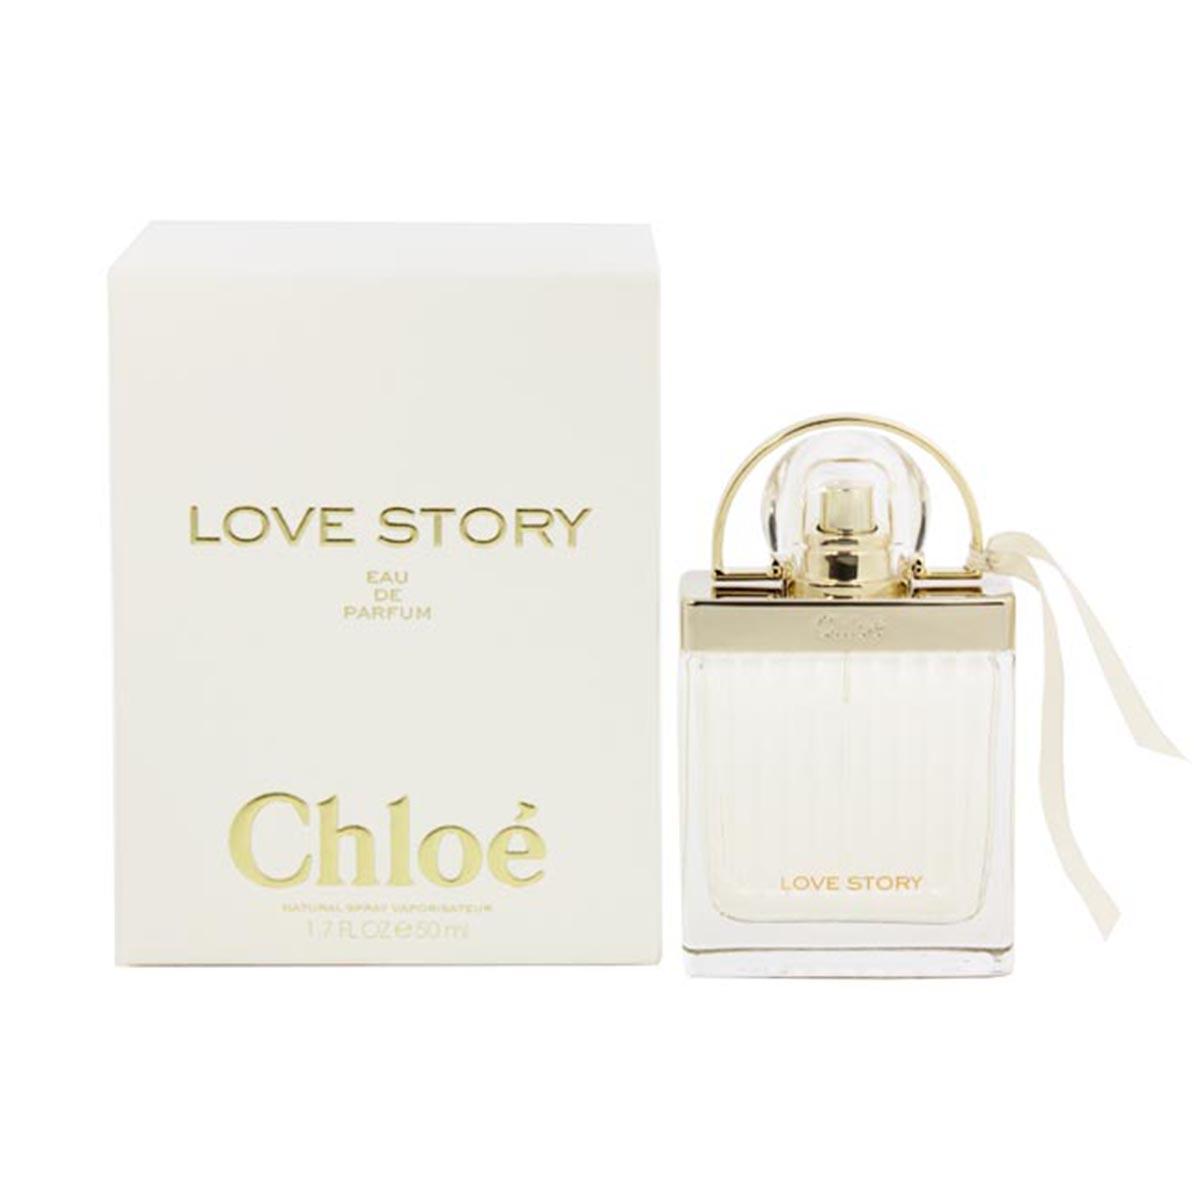 Chloe love story eau de parfum 50ml vaporizador